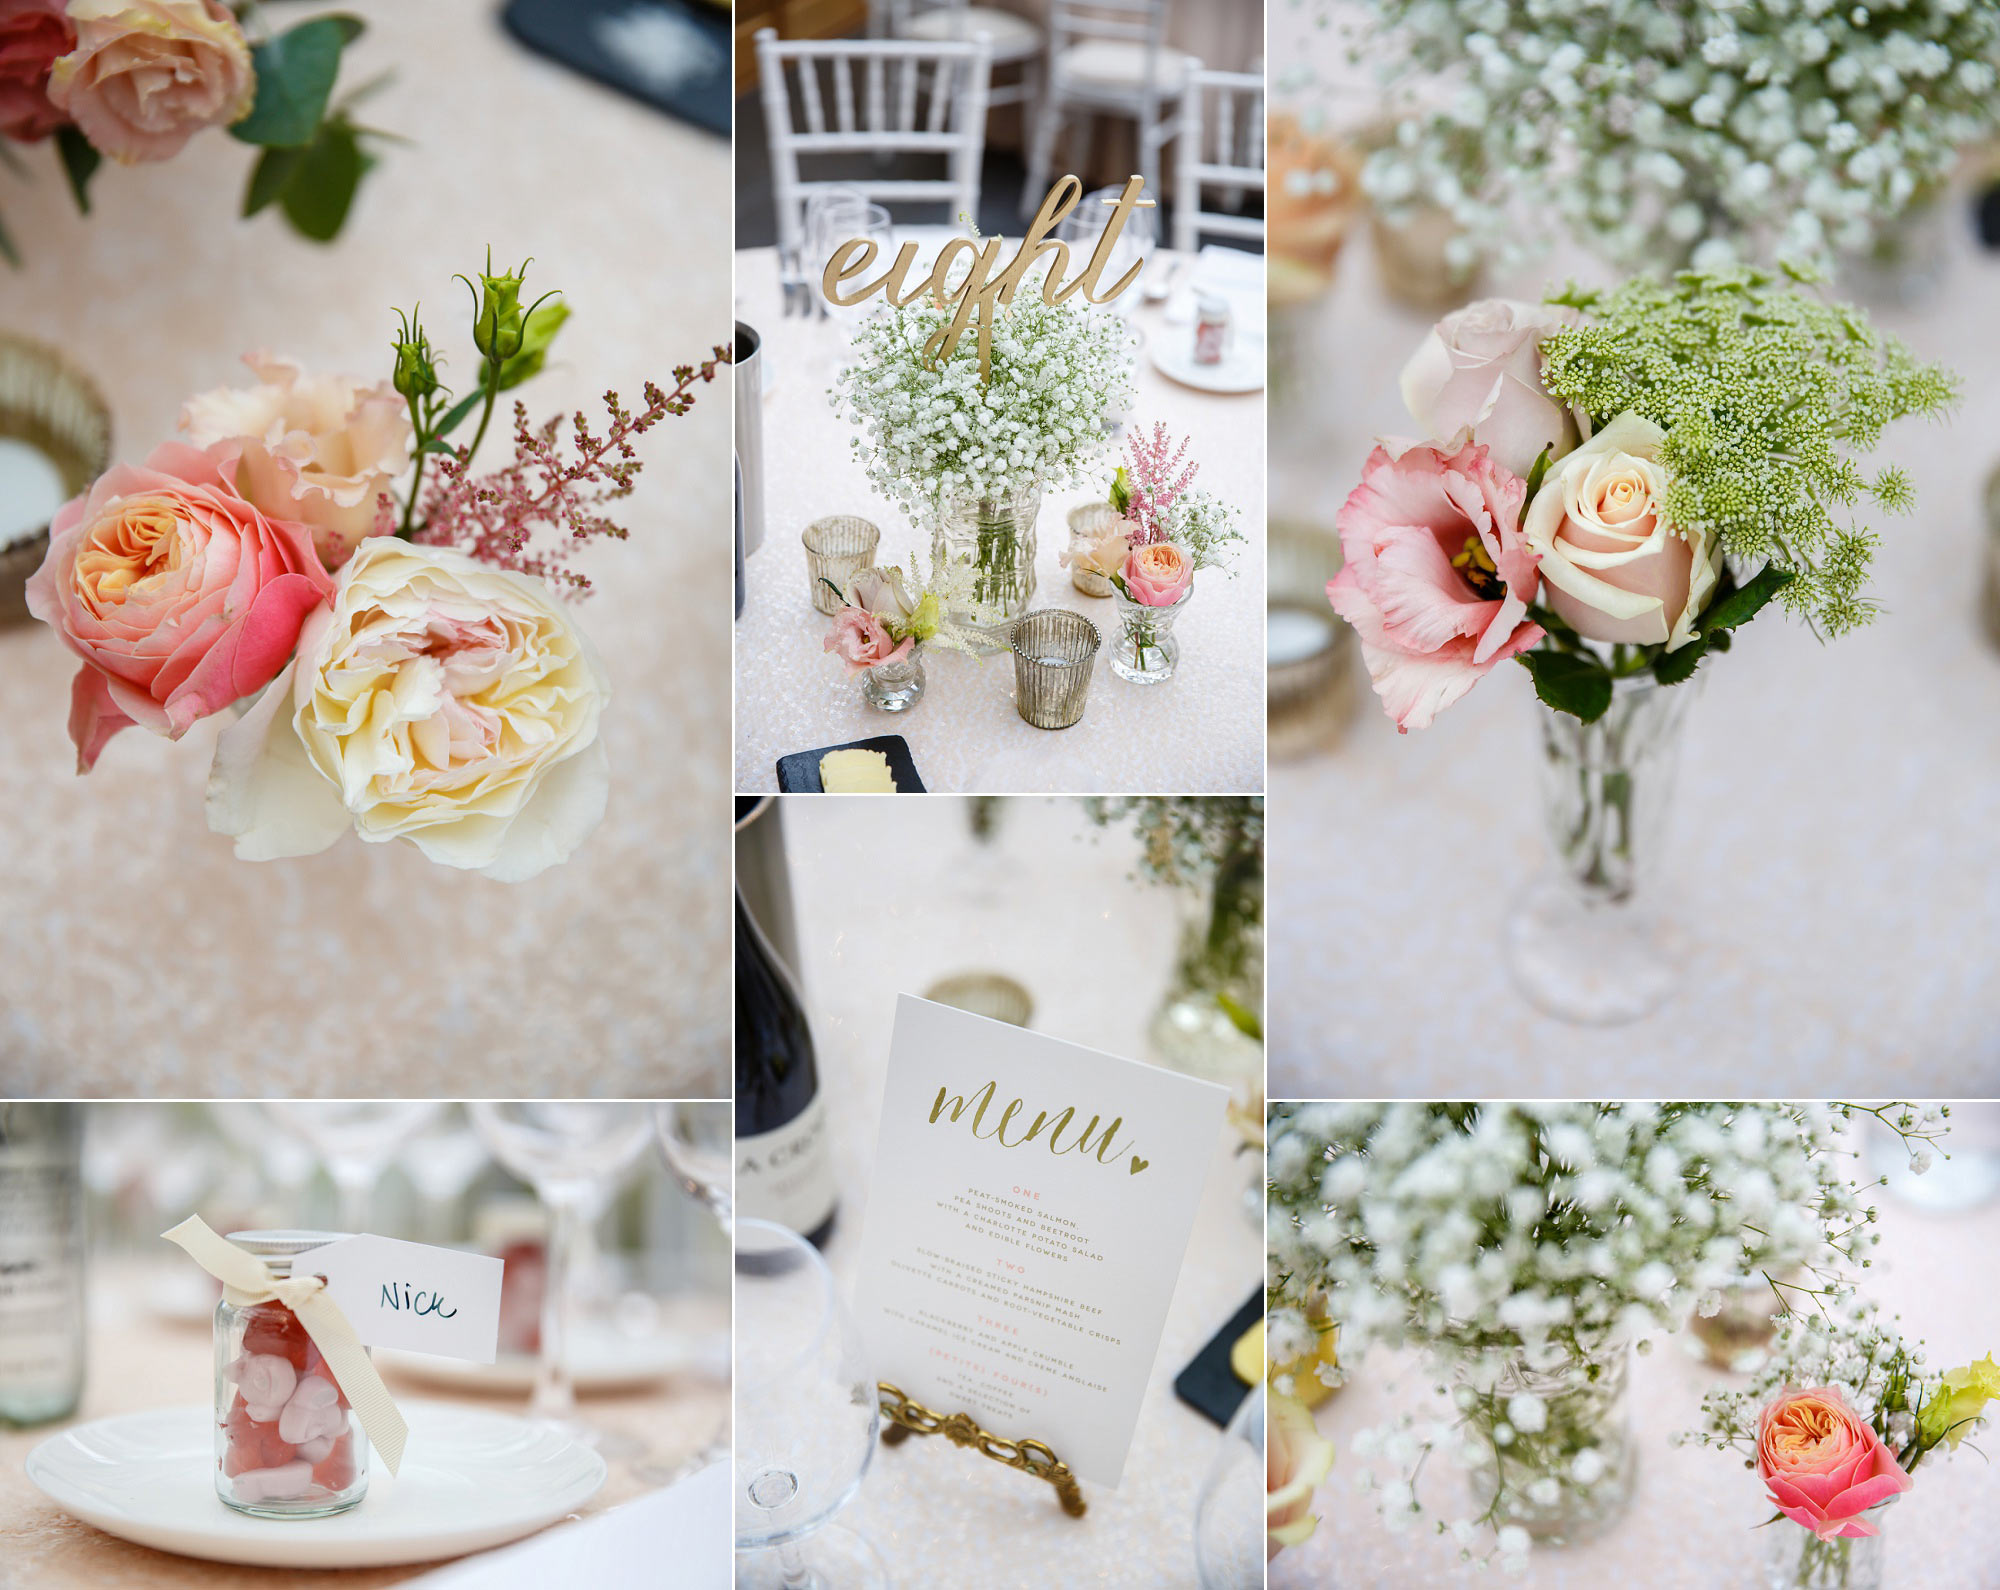 wedding tables at botleys mansion